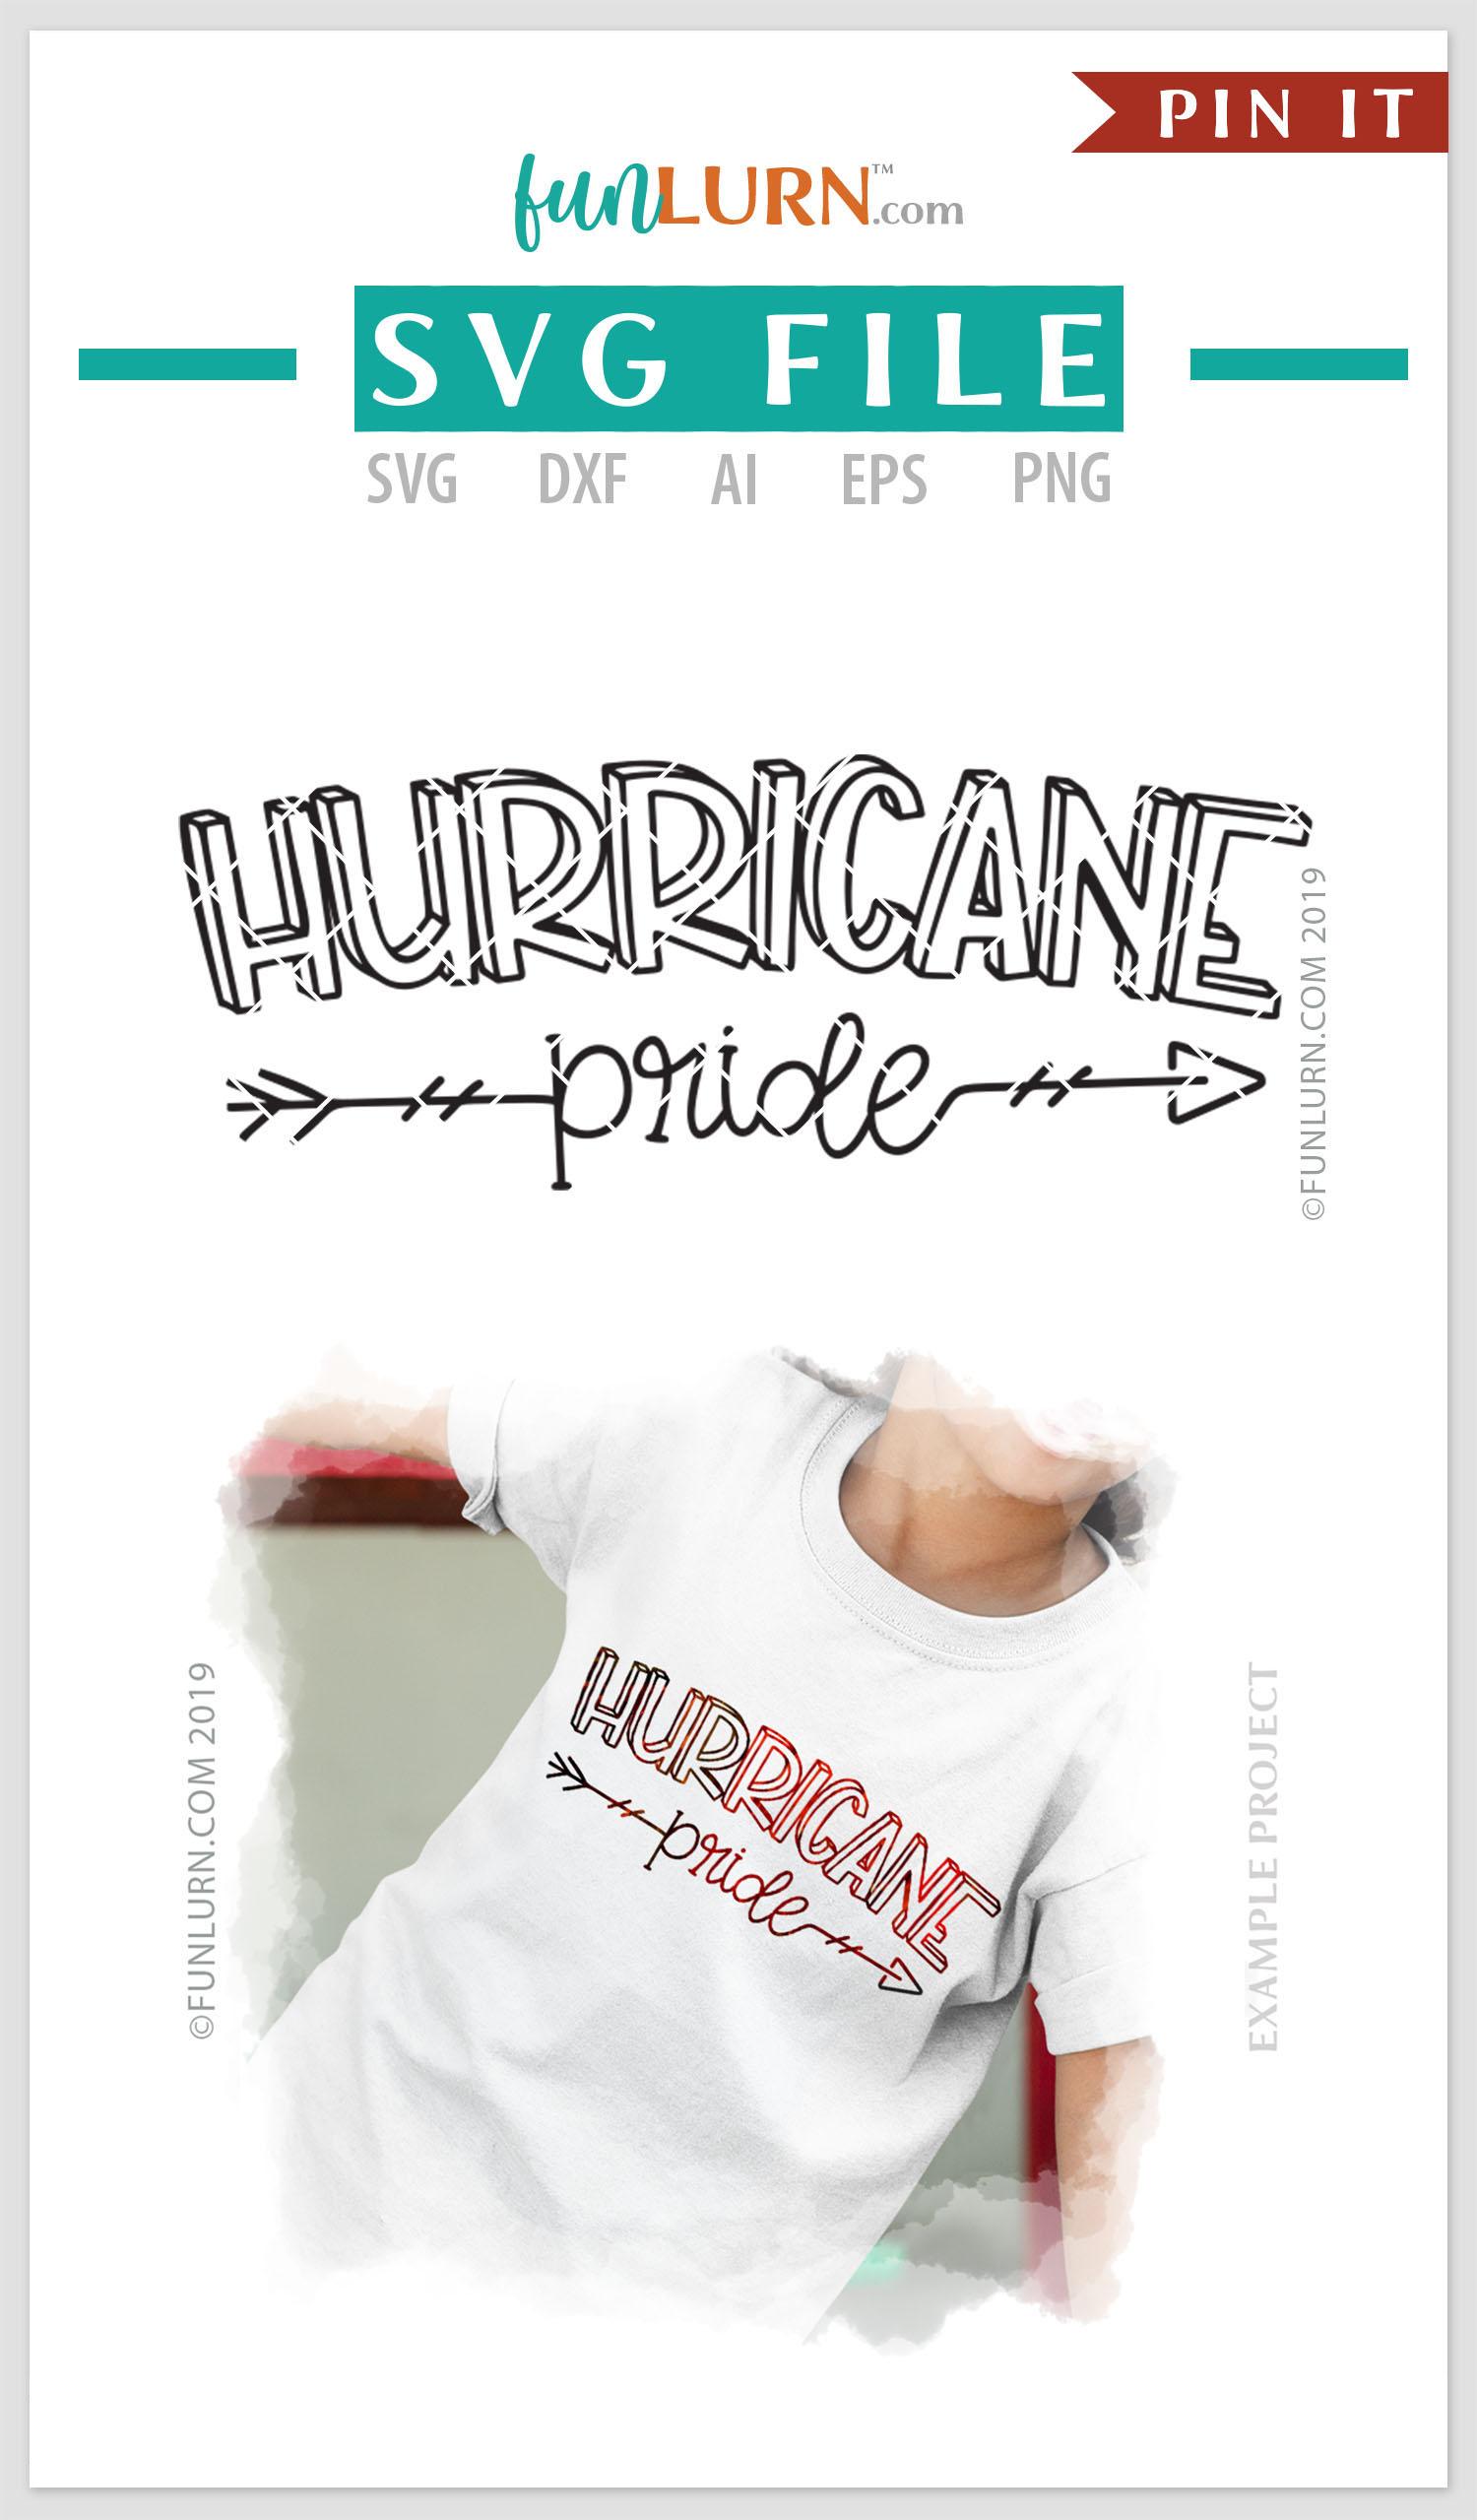 Hurricane Pride Team SVG Cut File example image 4